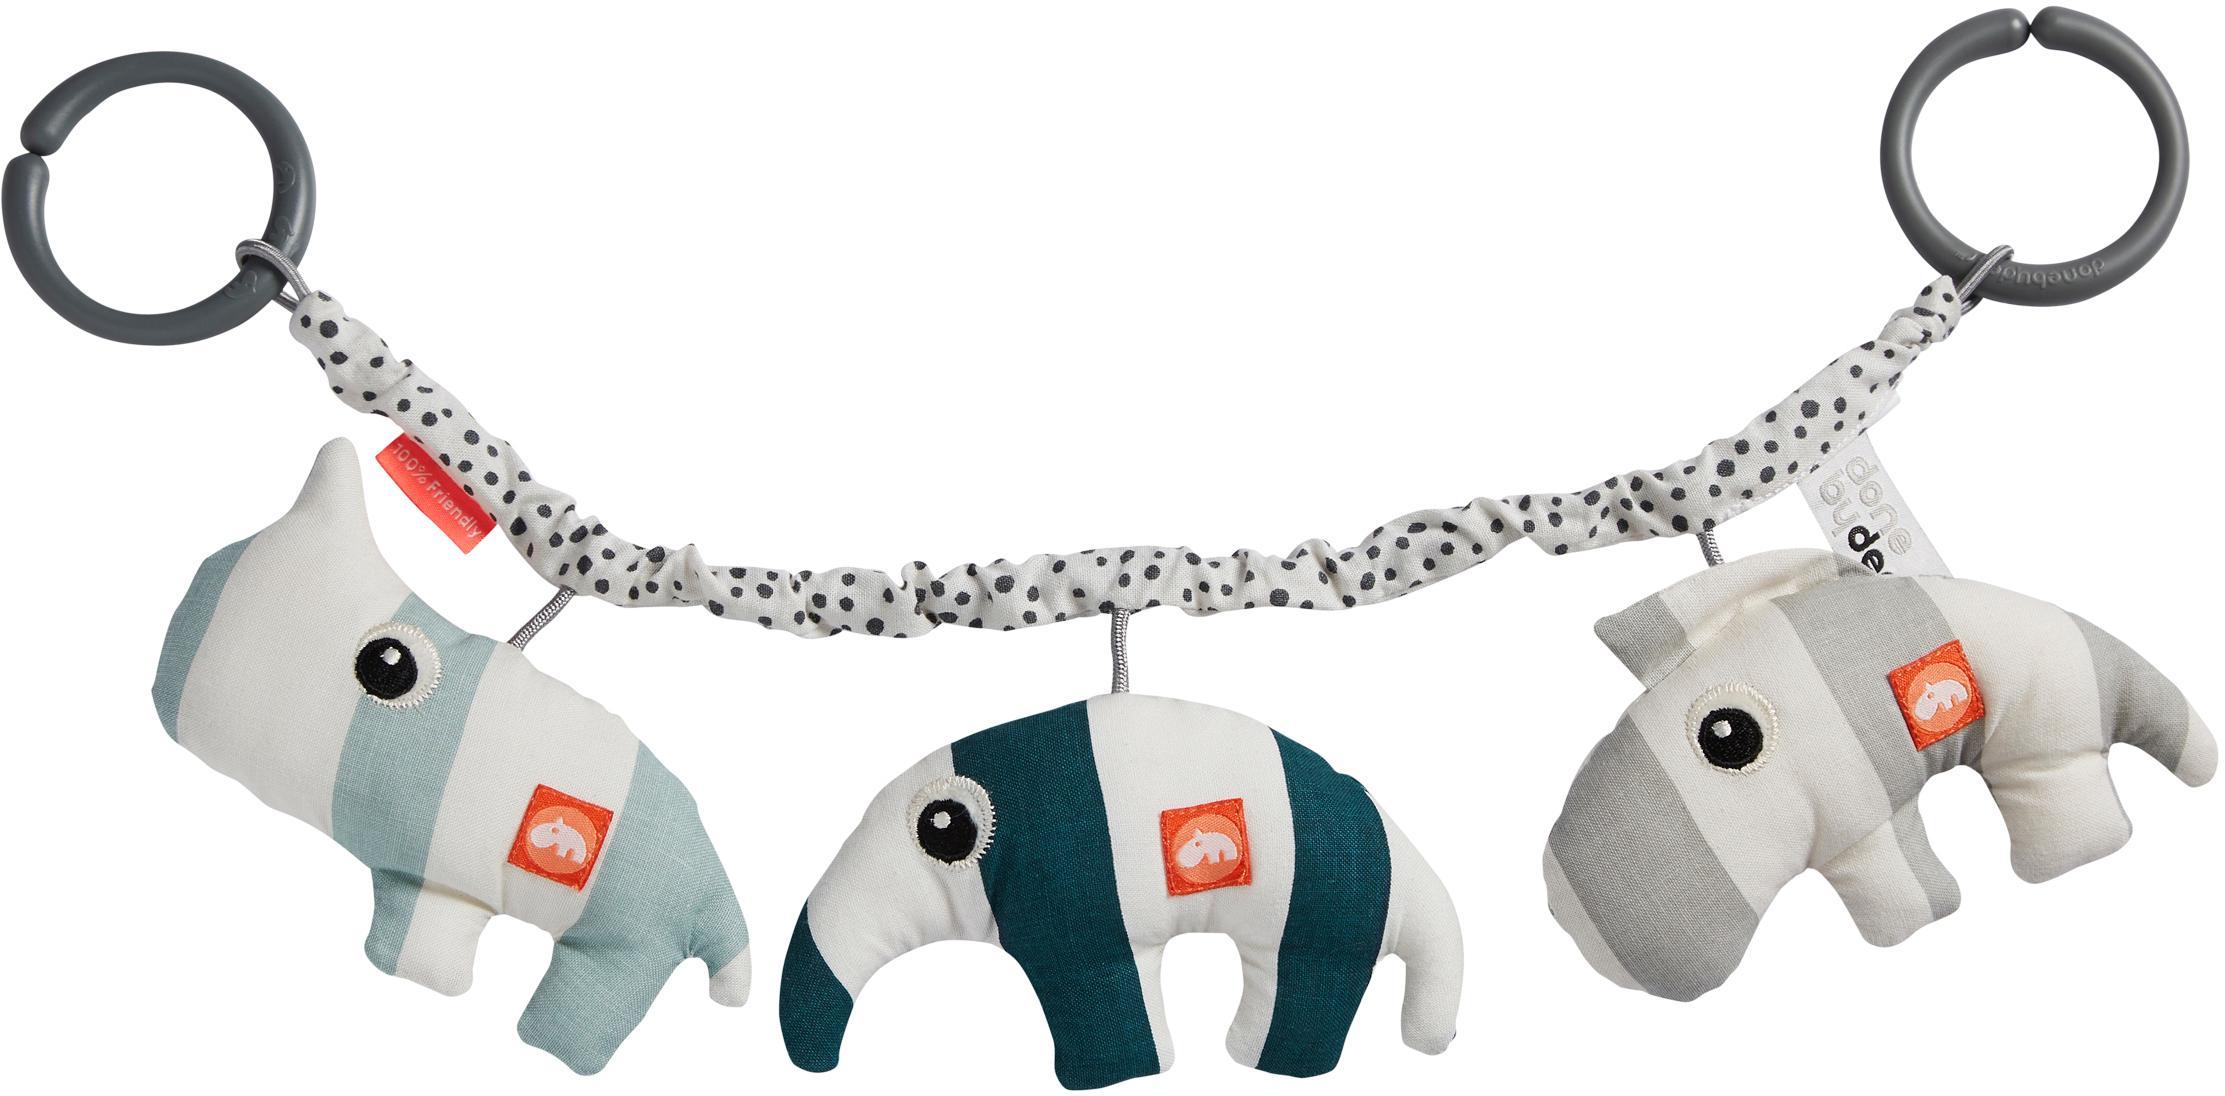 Kinderwagenspielzeug Deer Friends, Bezug: 100% Baumwolle, Mehrfarbig, 47 x 14 cm